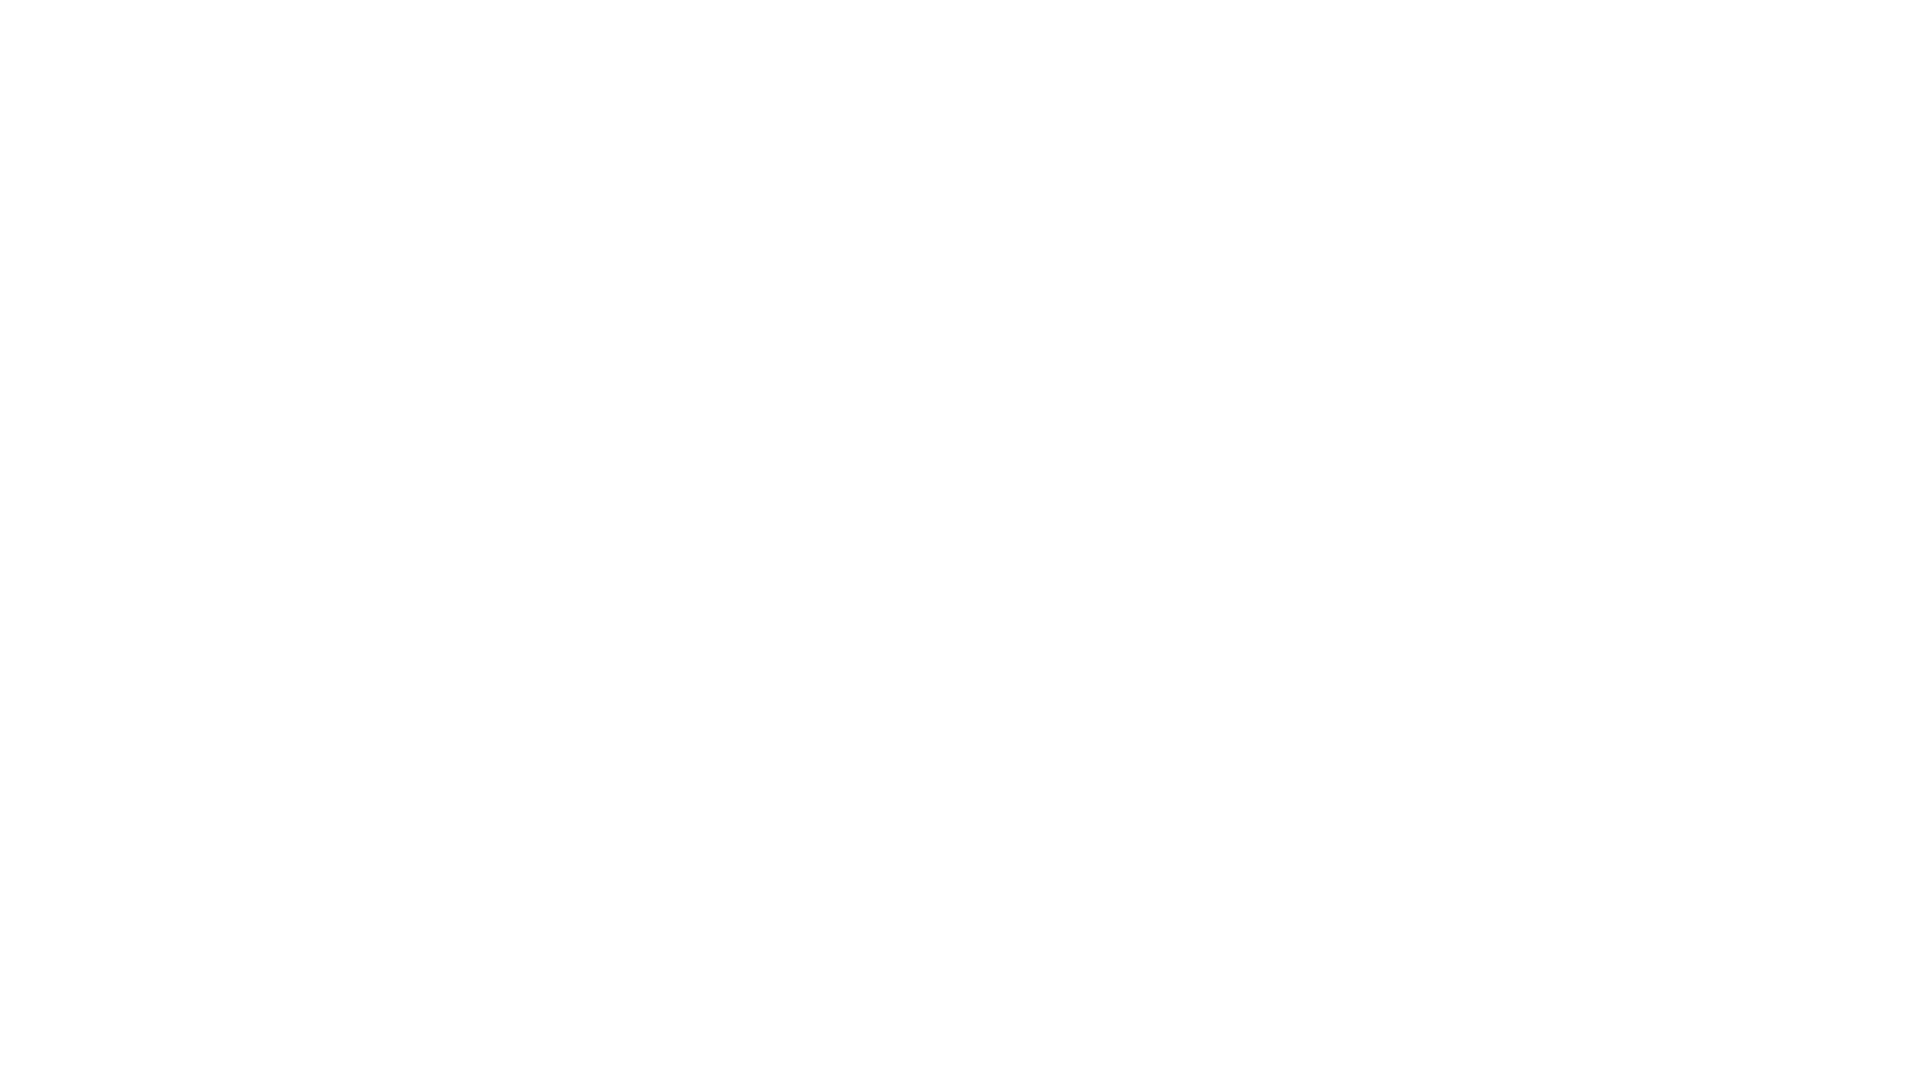 Moses_mastering_m_white_transparent